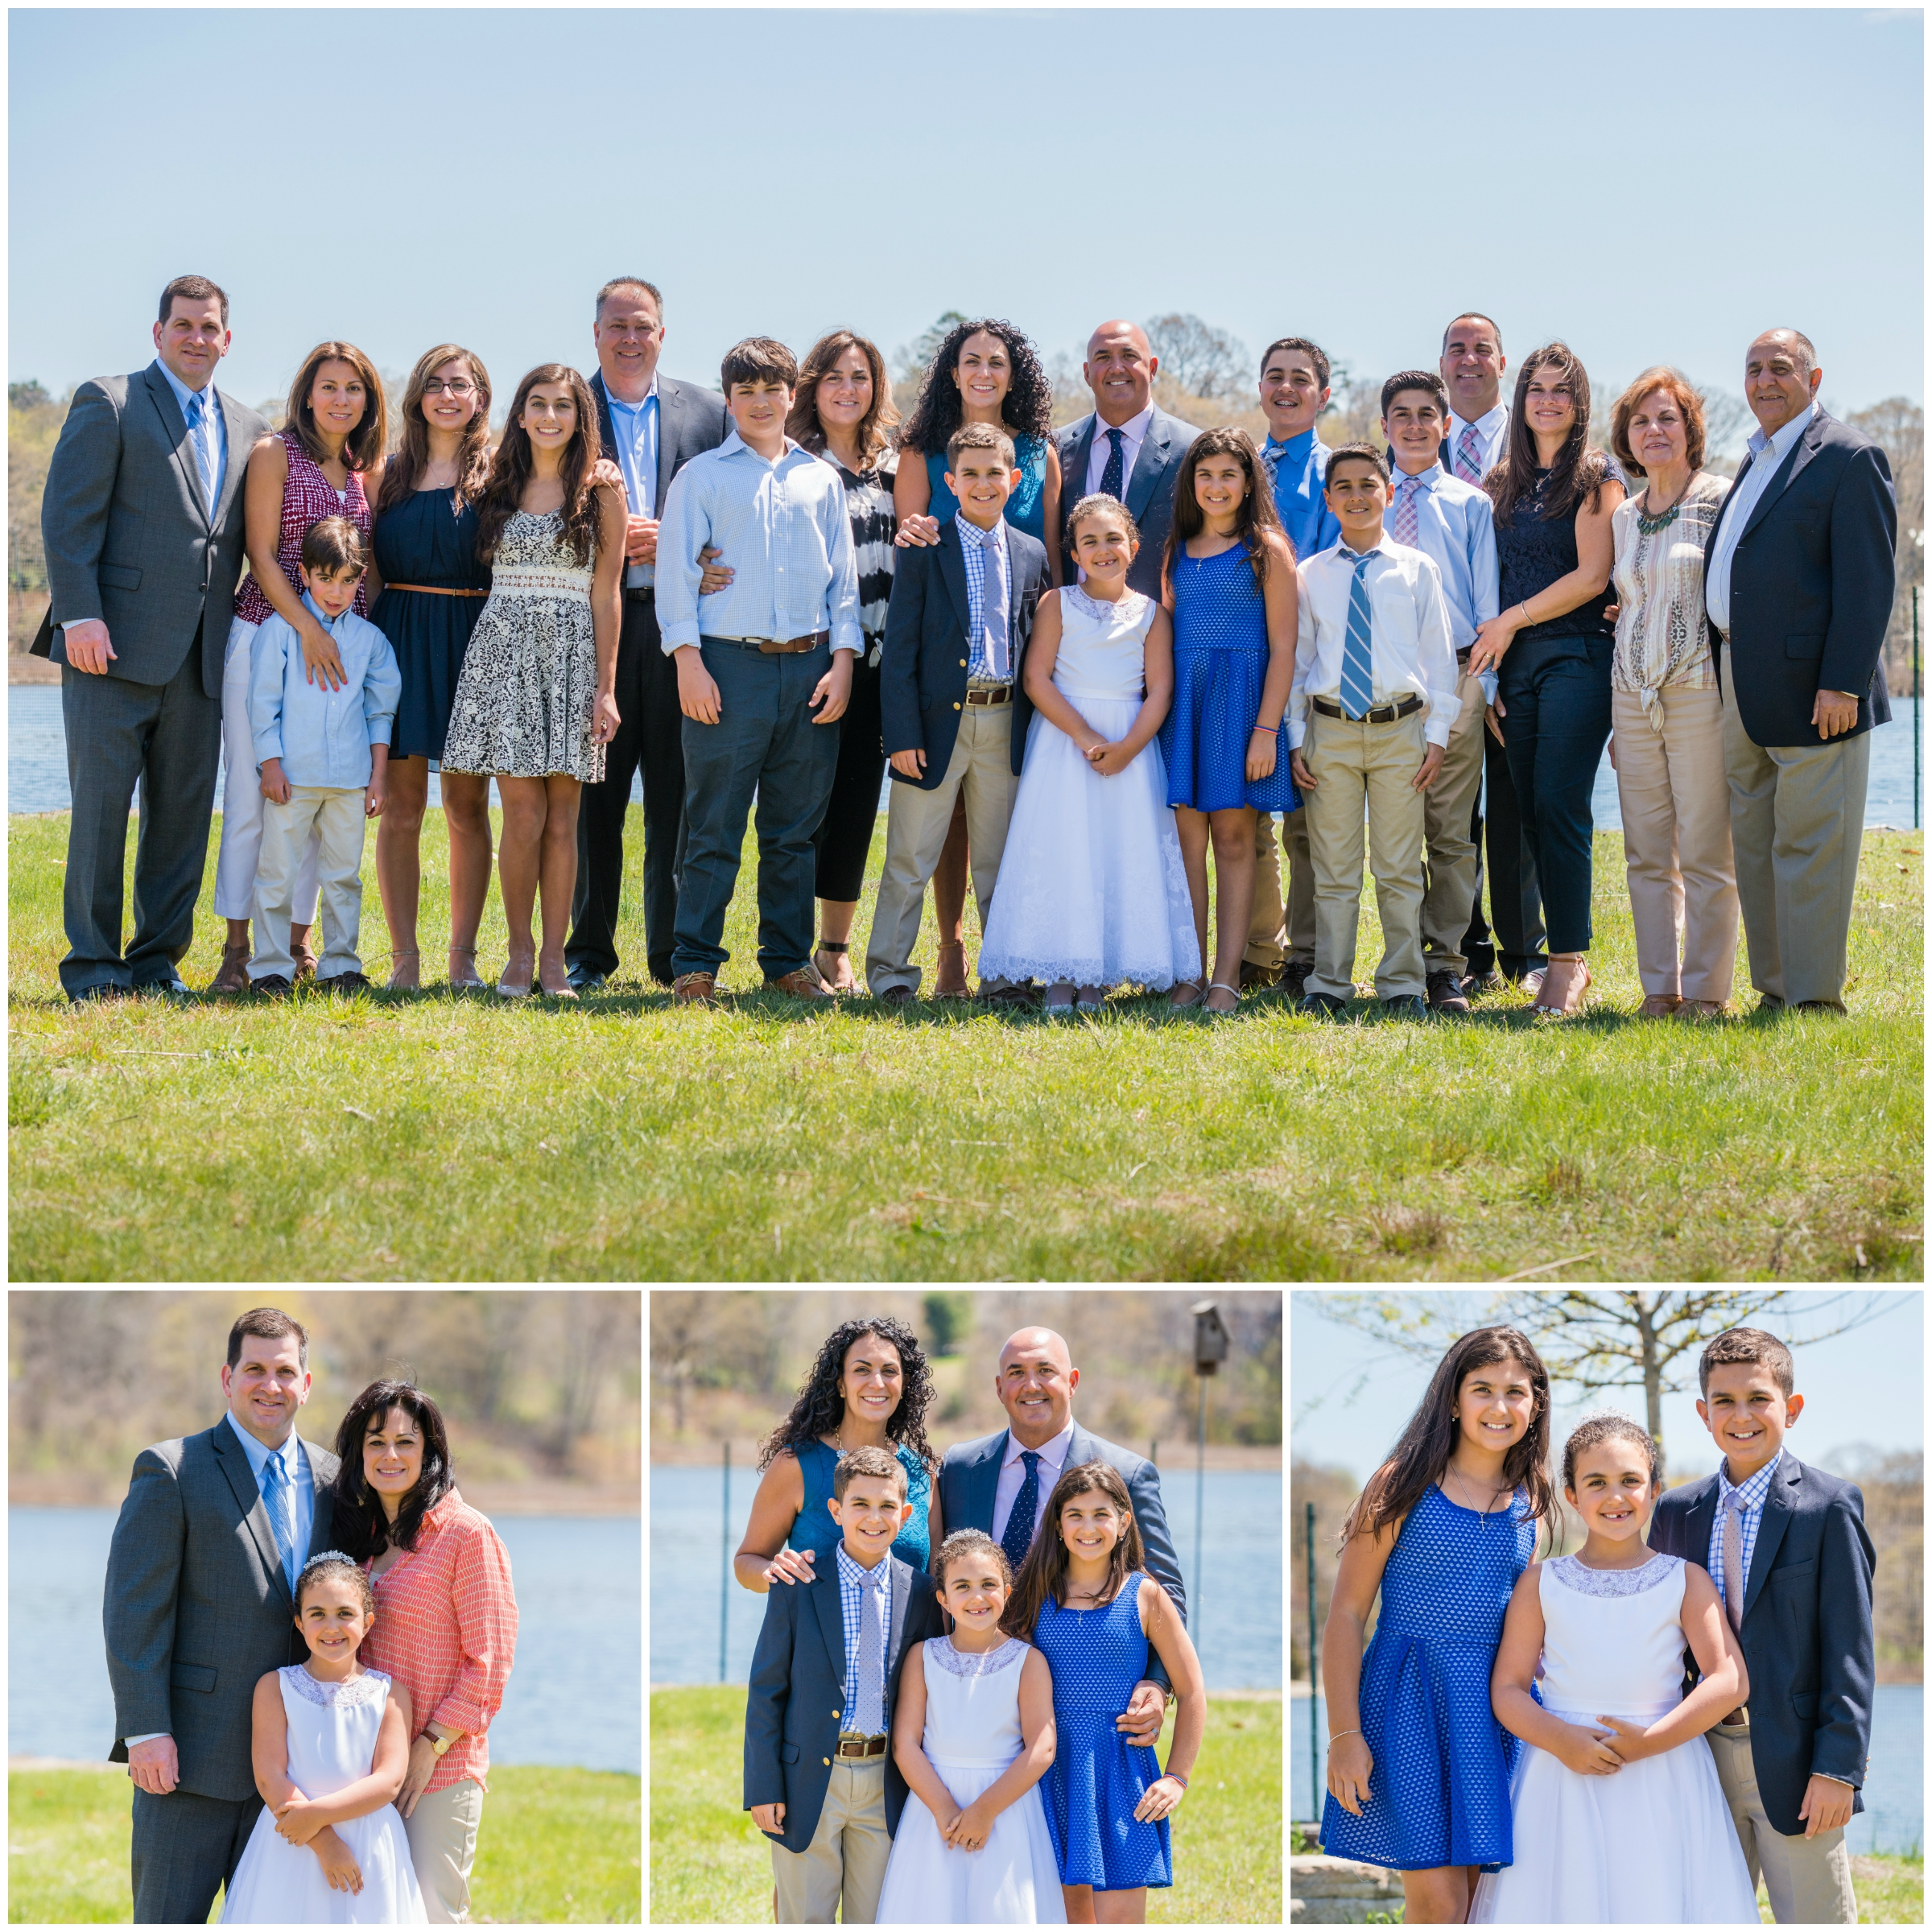 family-portrait-photographer-stamford-ct